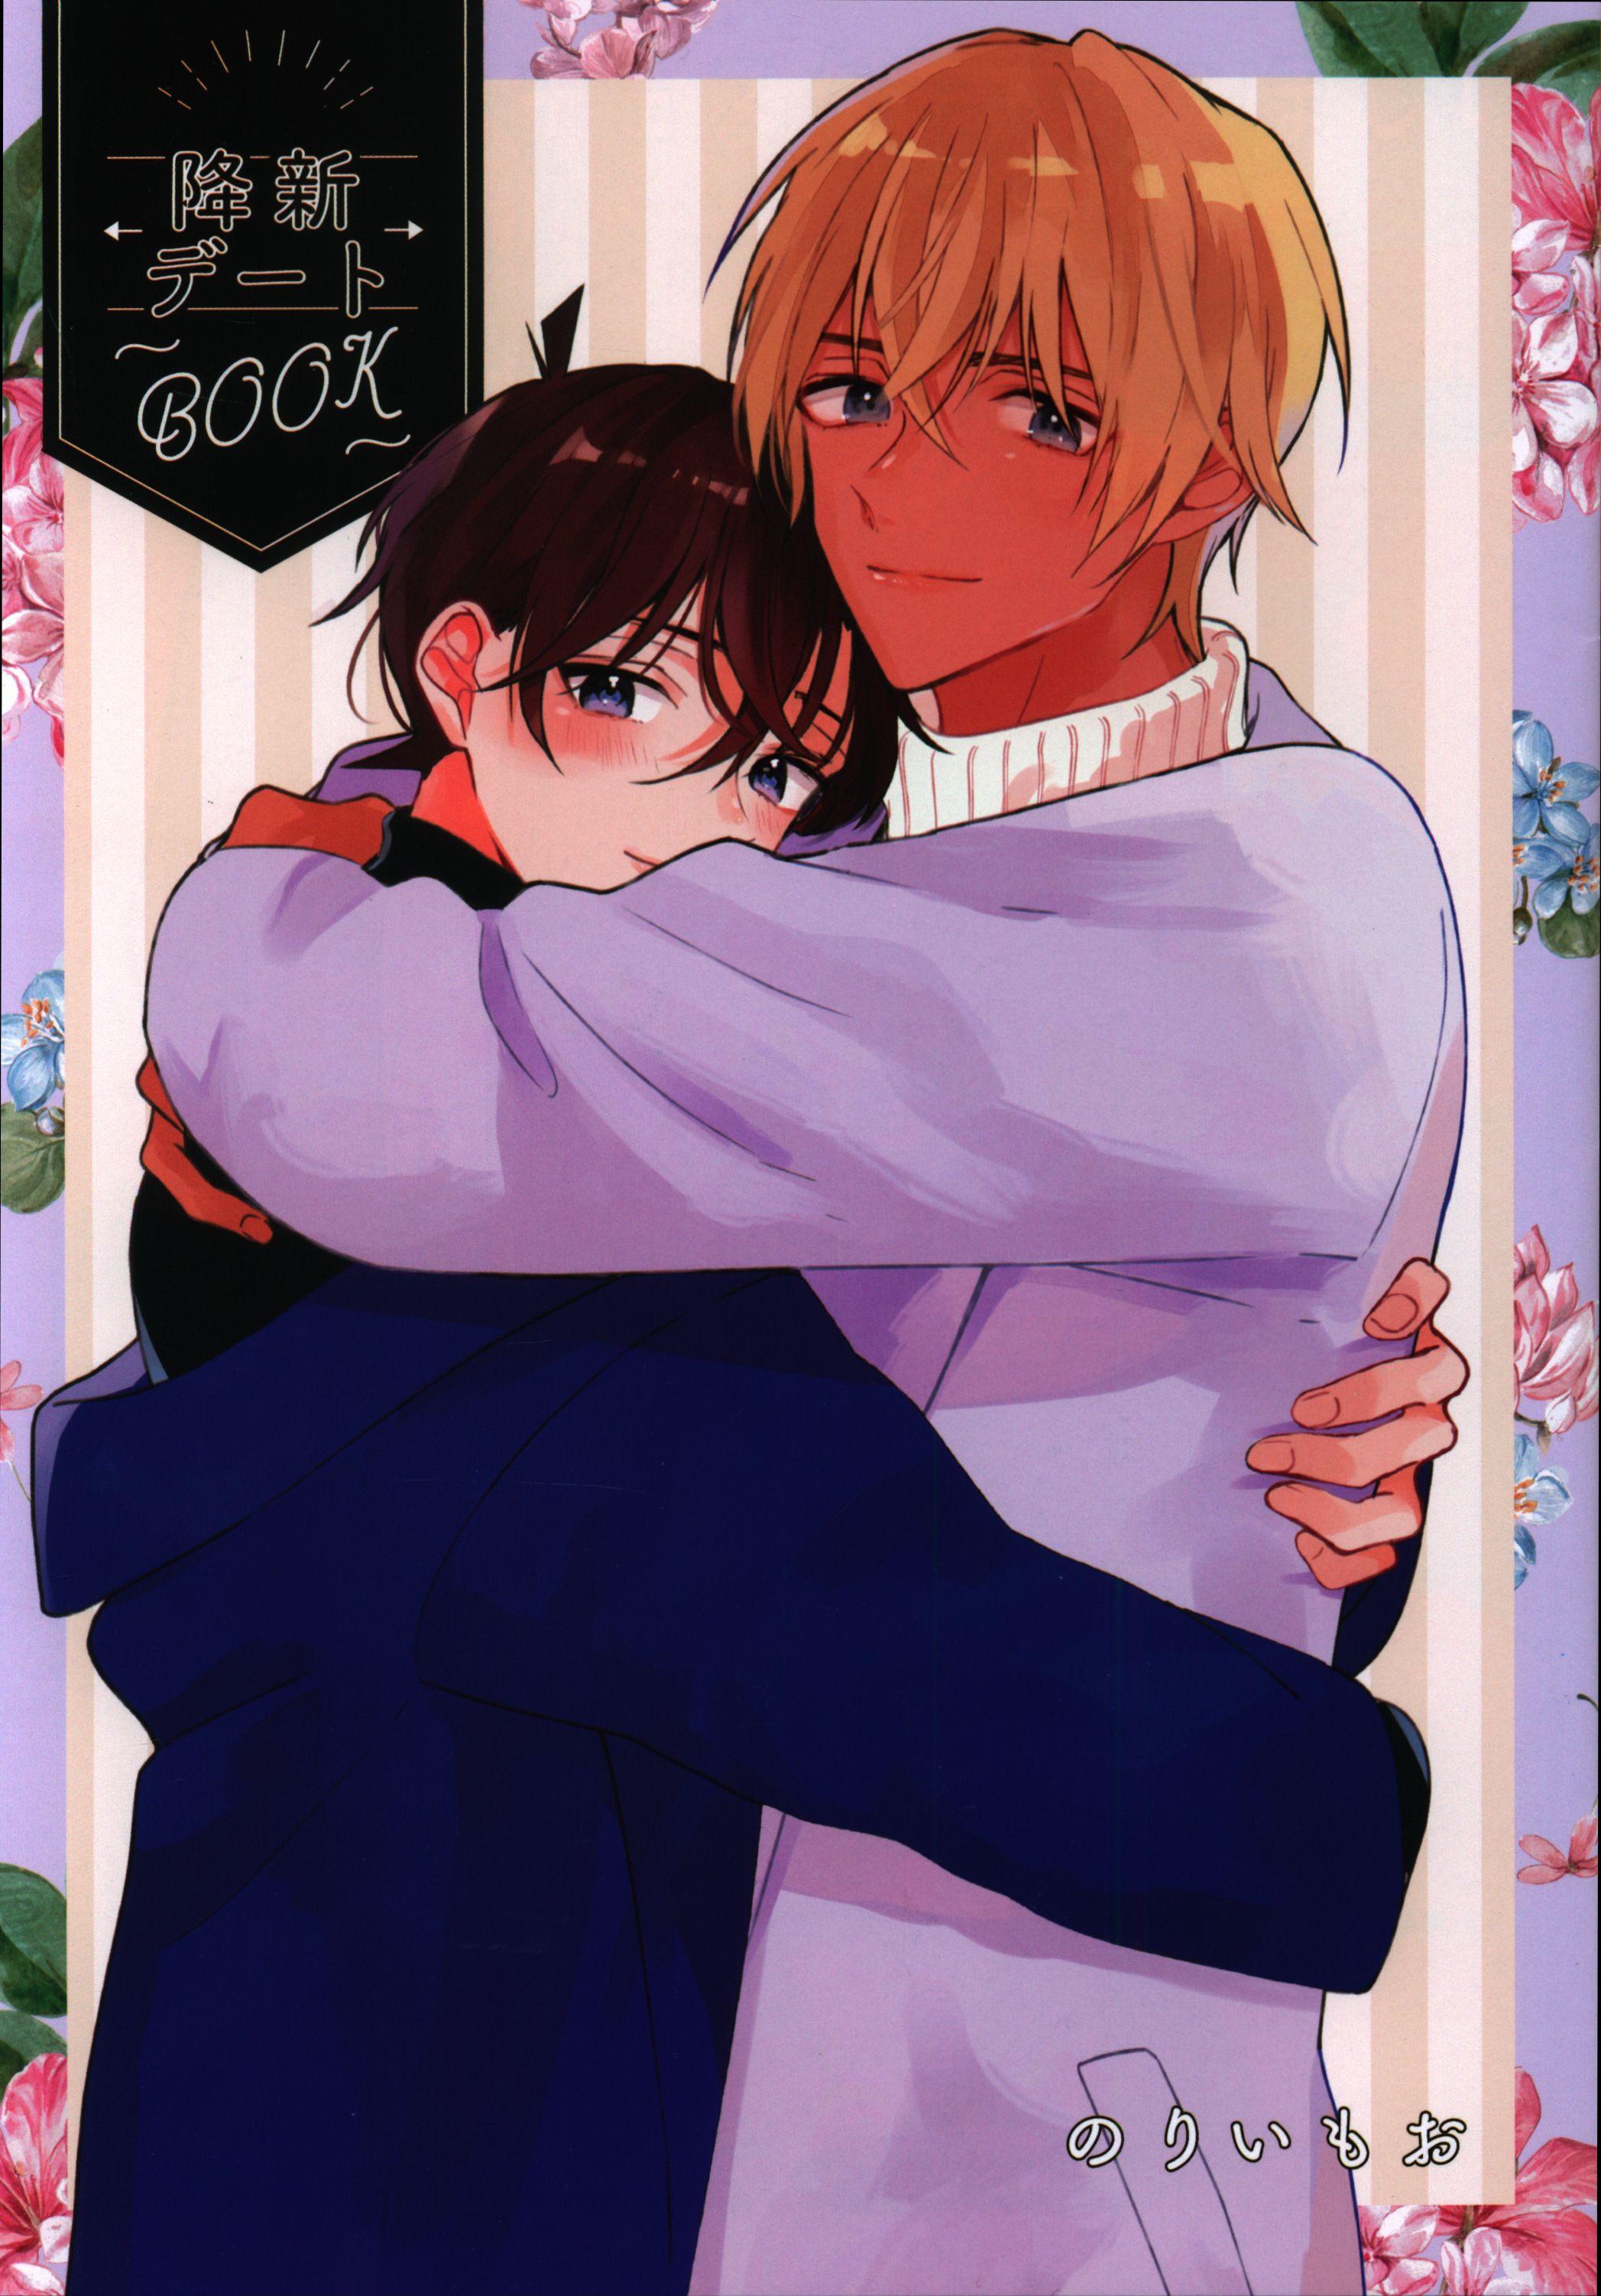 USED) Doujinshi - Meitantei Conan / Amuro Tooru x Kudou Shinichi  (降新デートBOOK) / バカサバイバー